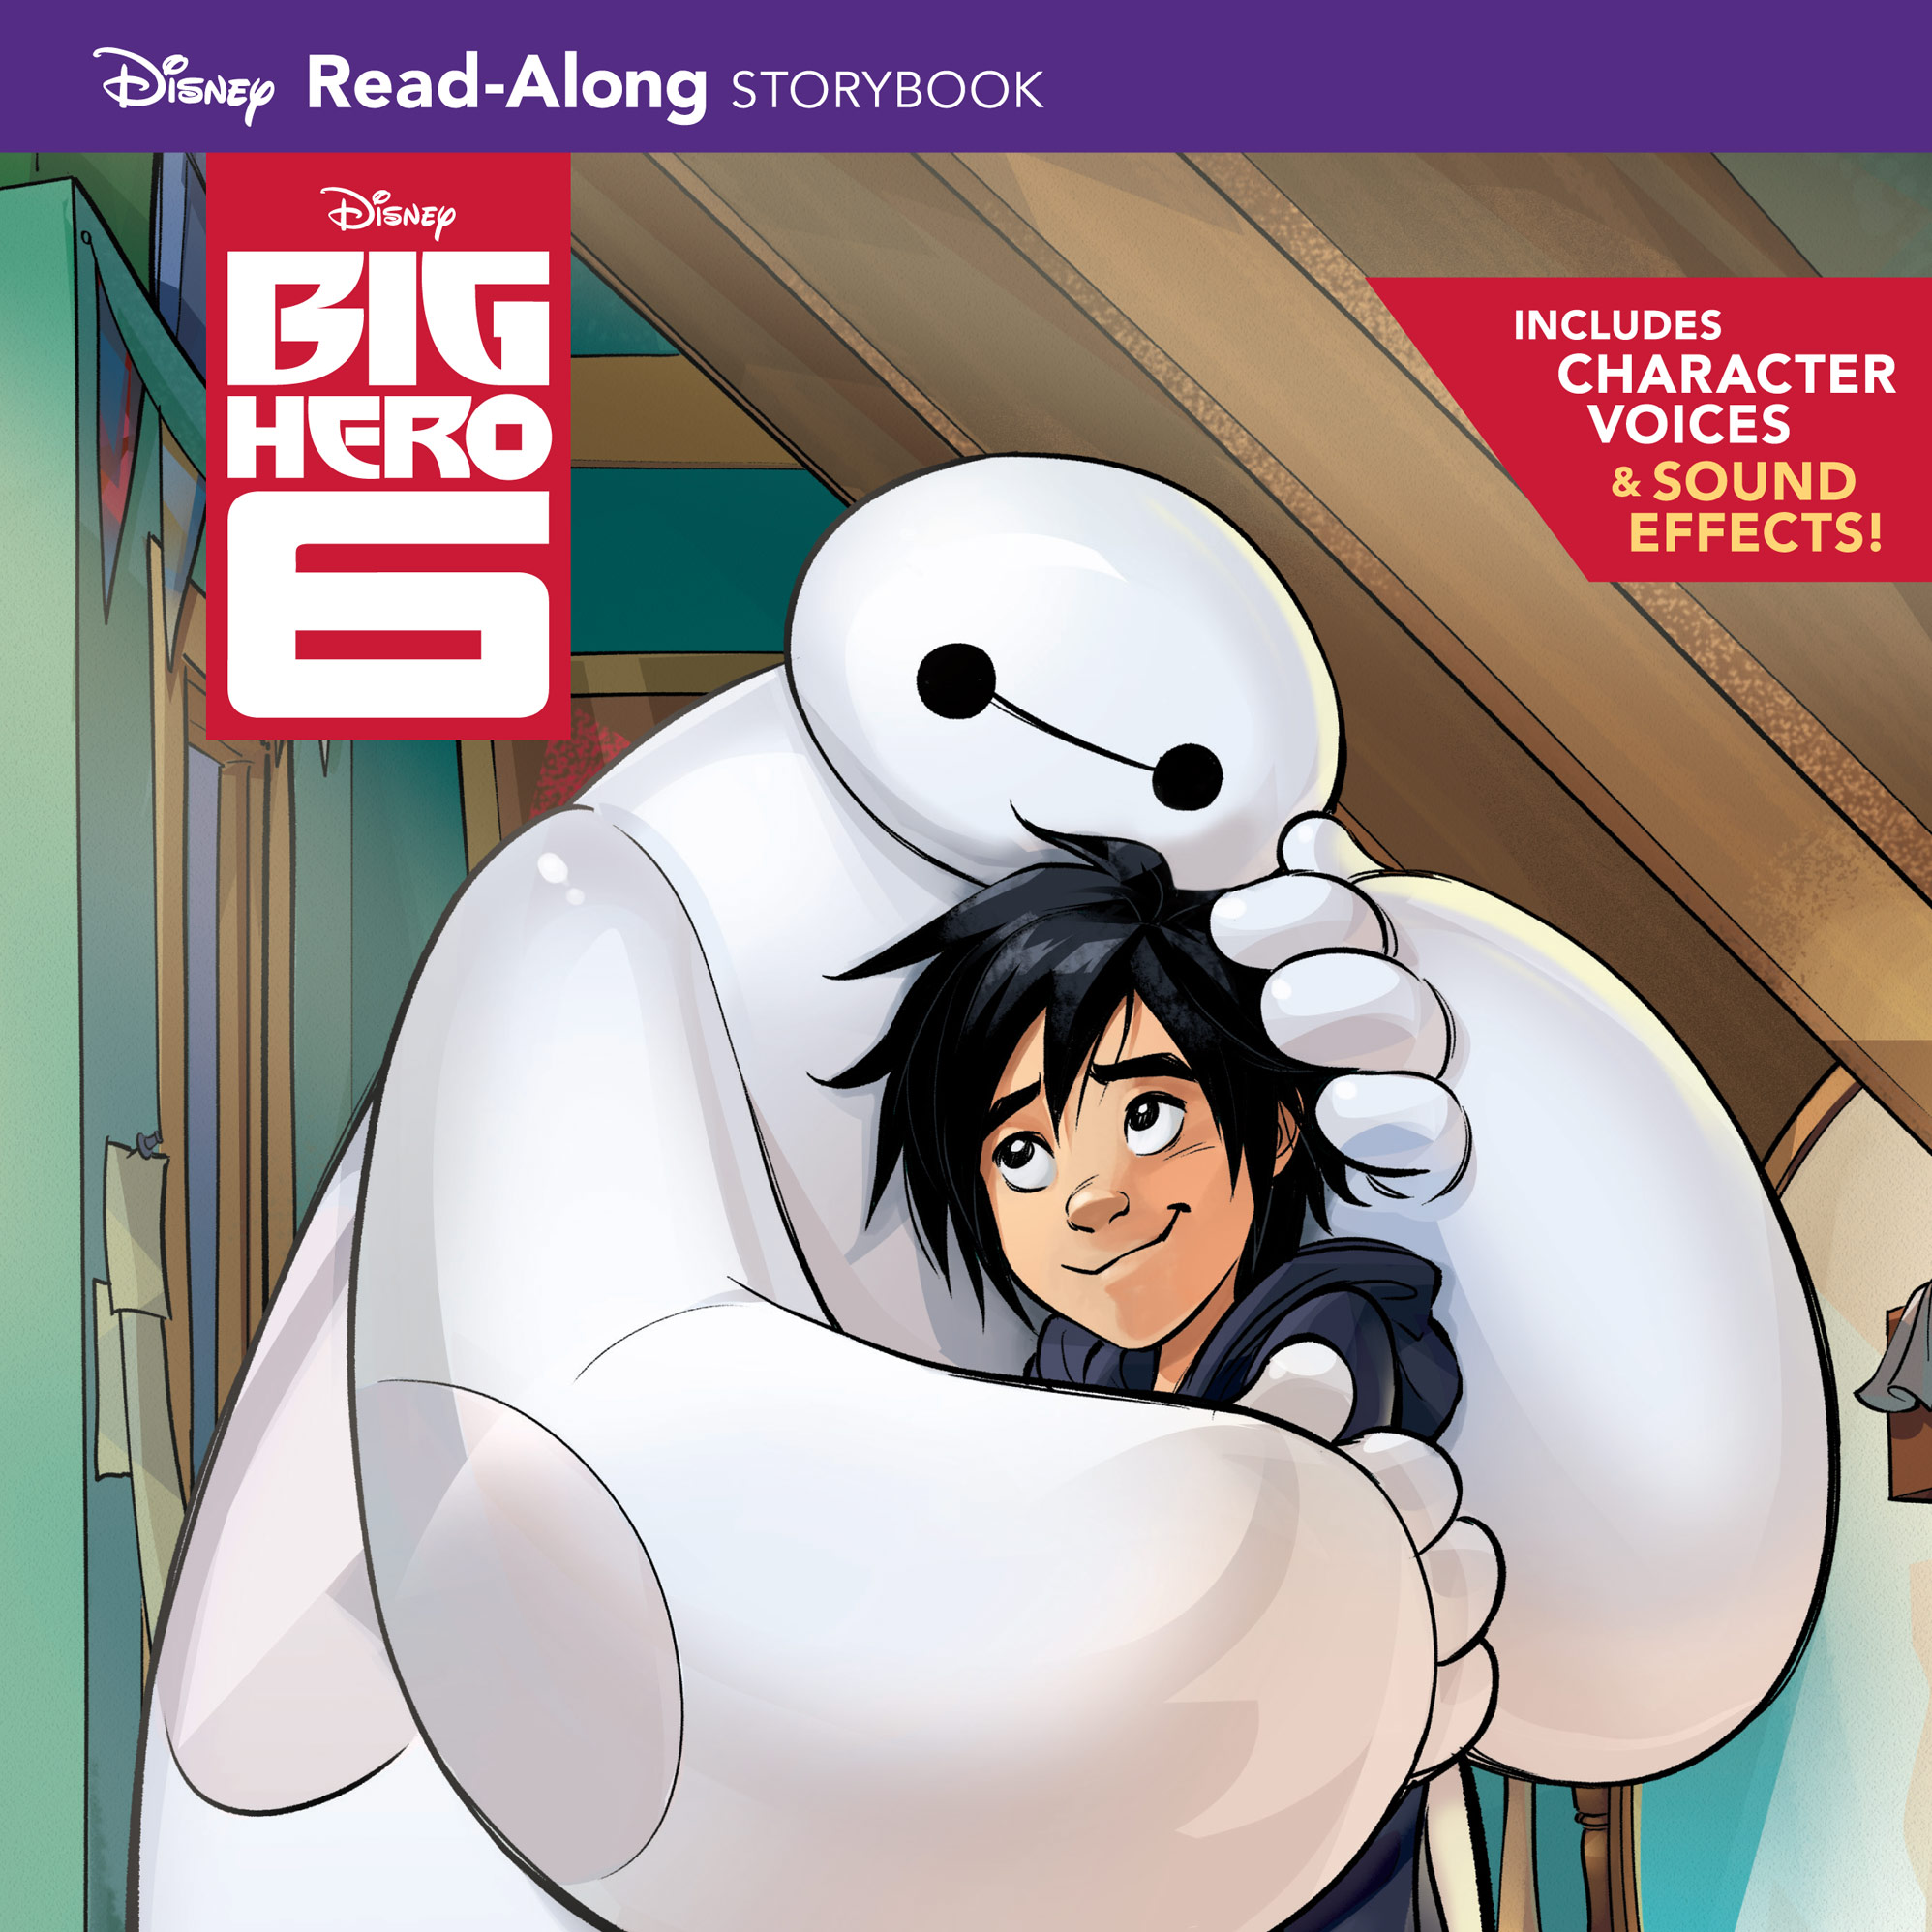 Big Hero 6 Read-Along Storybook